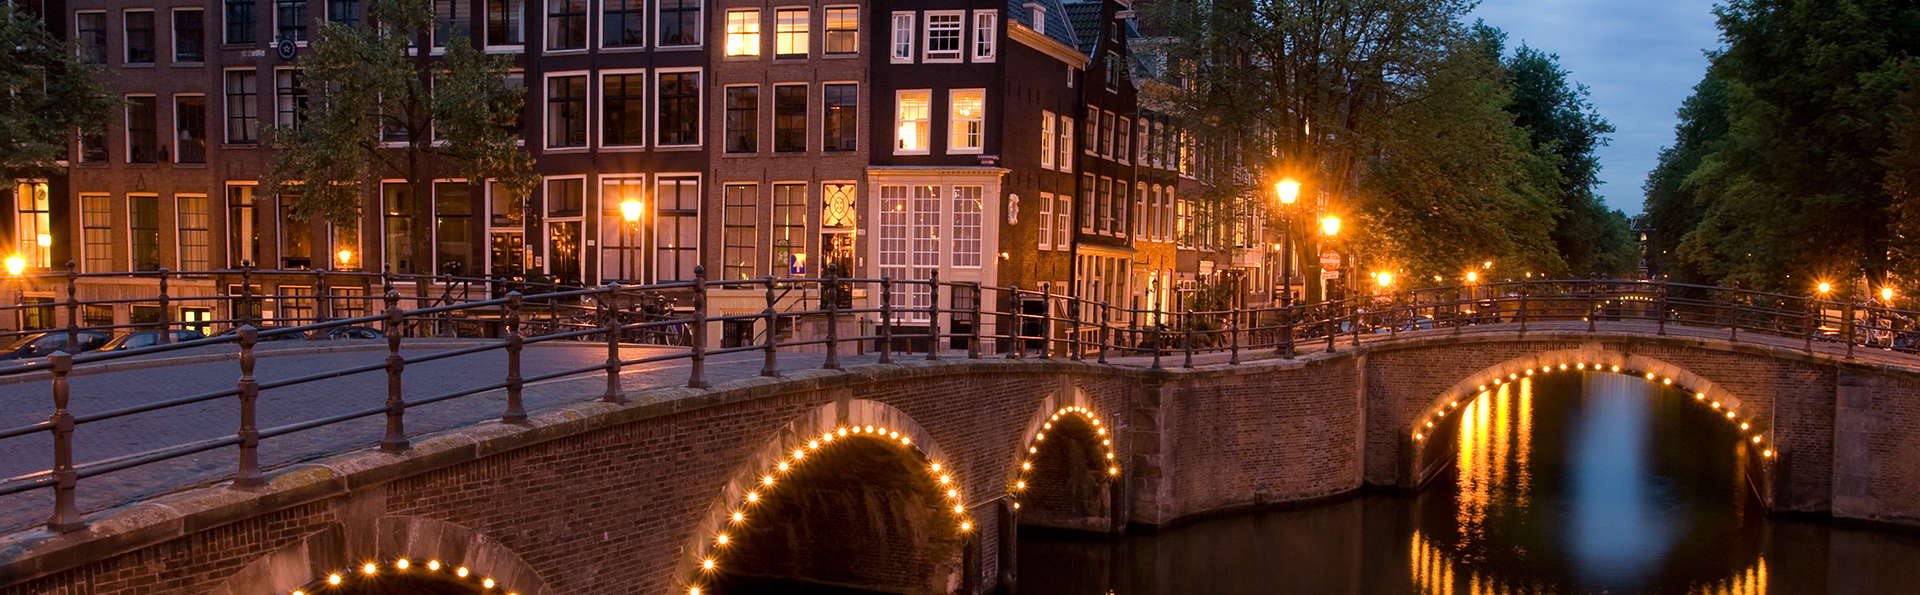 Hotel Casa Amsterdam - Edit_Amsterdam3.jpg